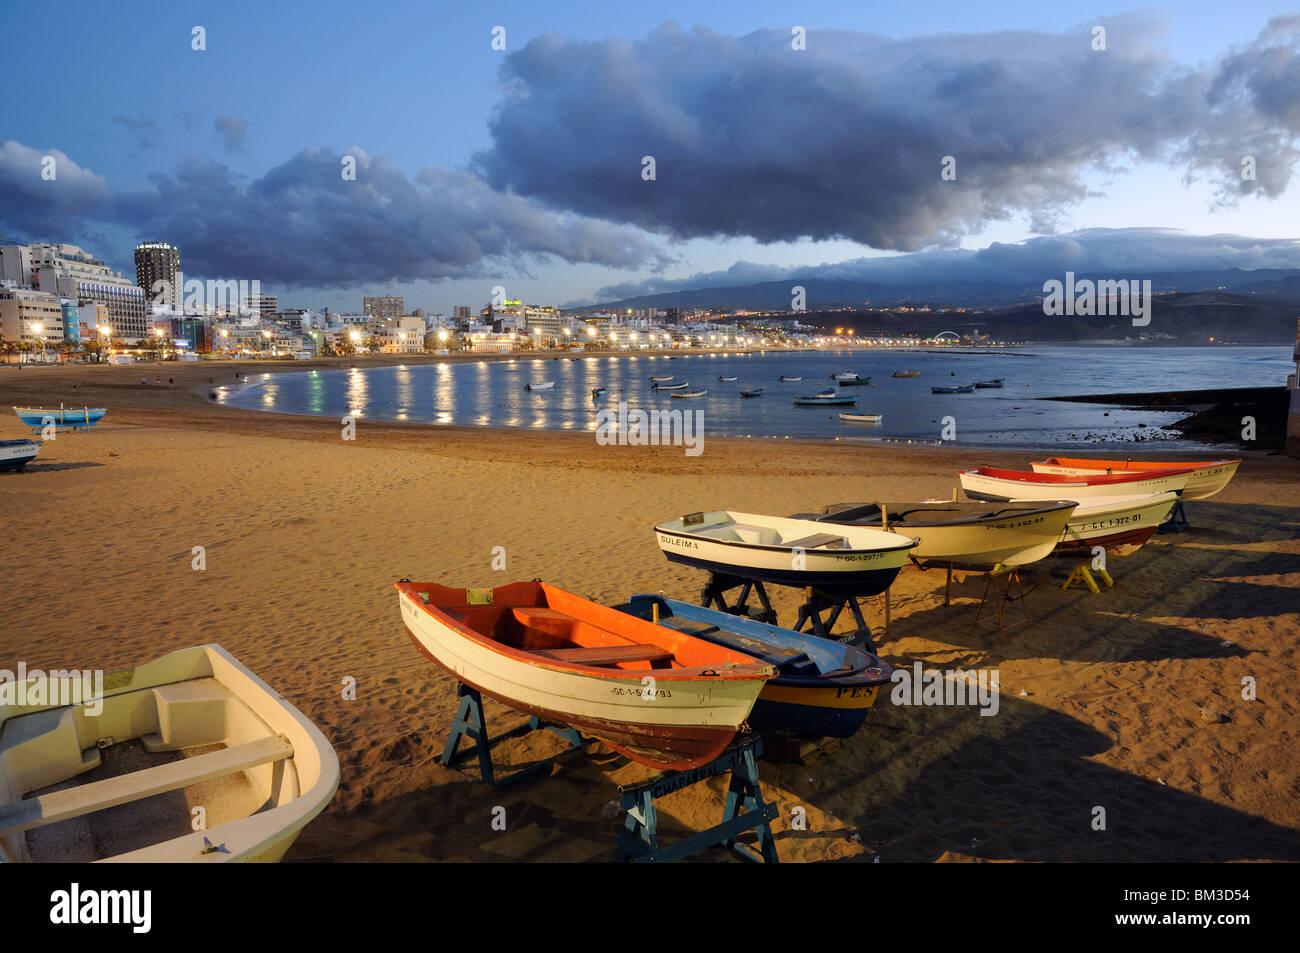 Fishing boats on the beach. Las Palmas de Gran Canaria, Spain - Stock Image